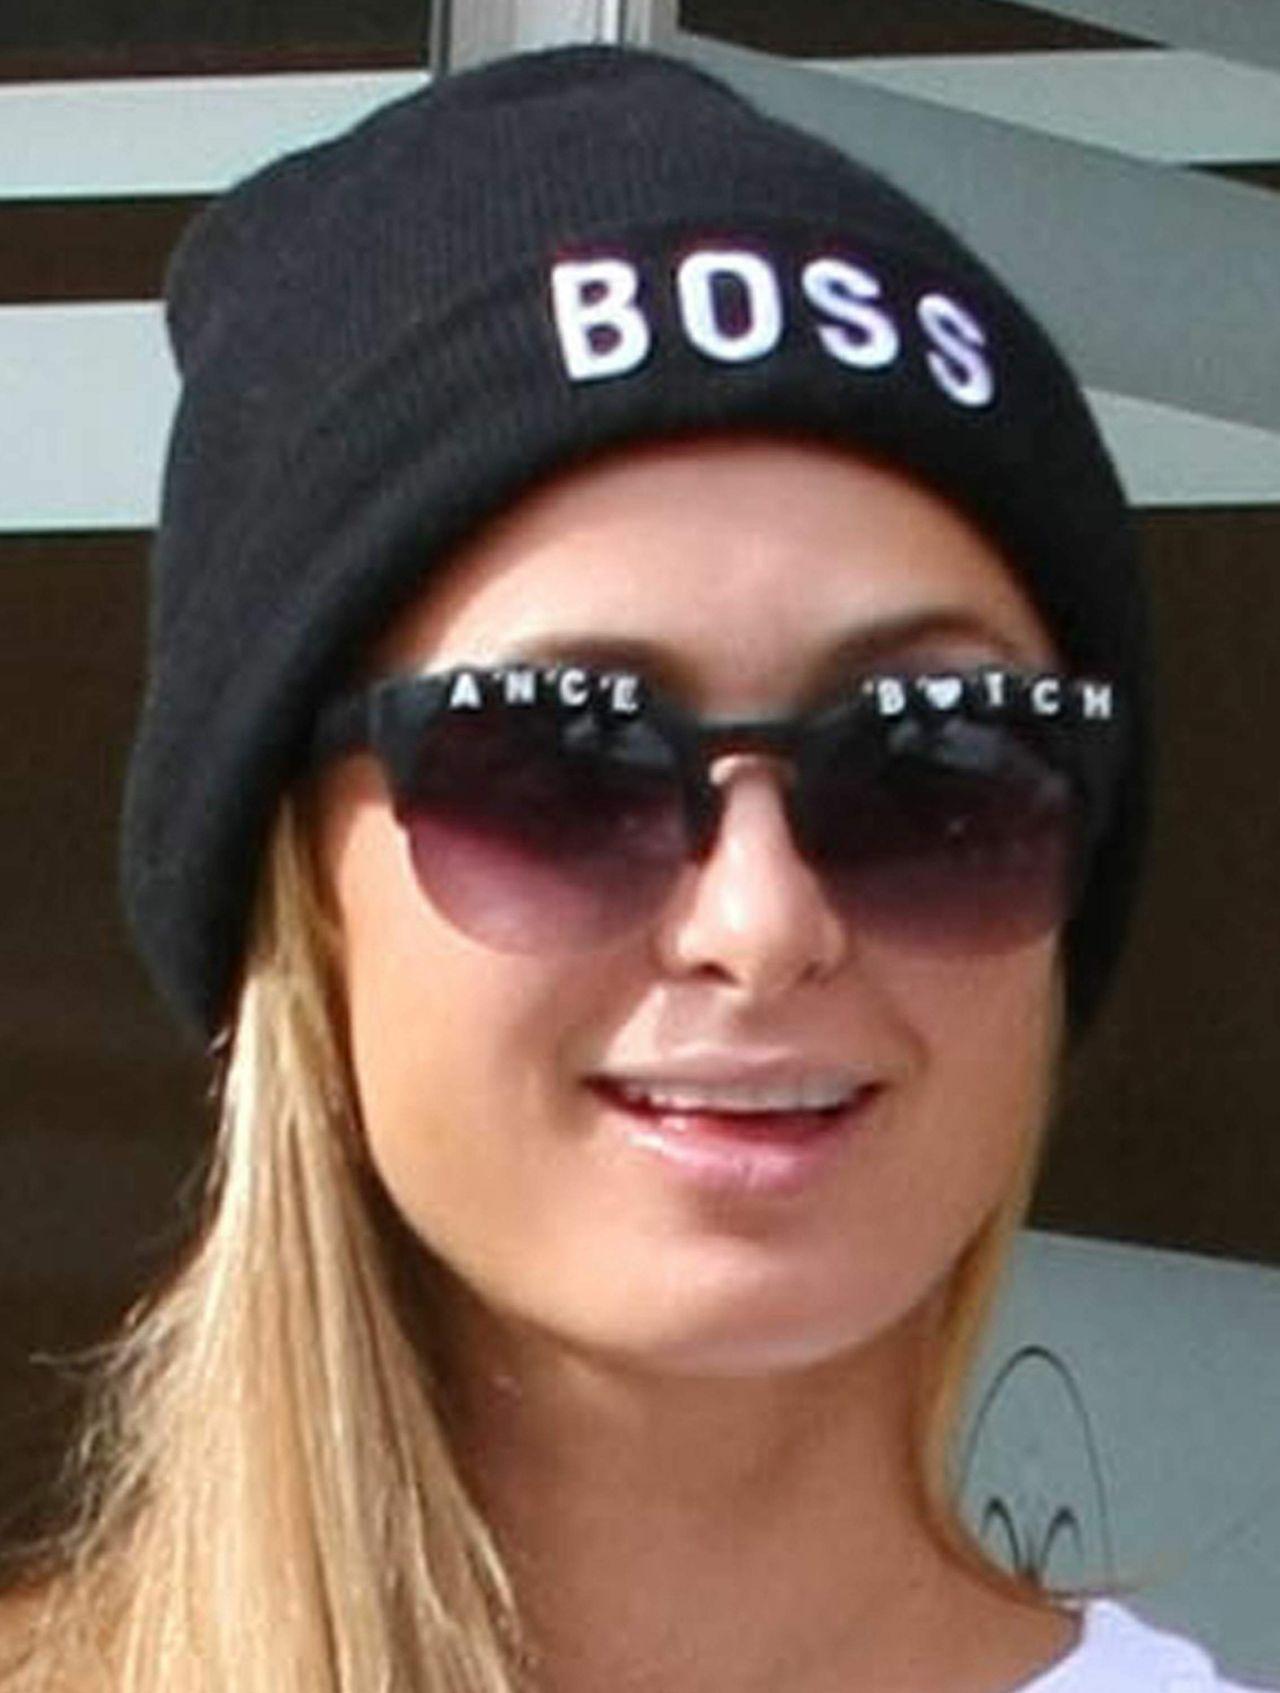 Paris Hilton Leaving The Anastasia Salon In Beverly Hils